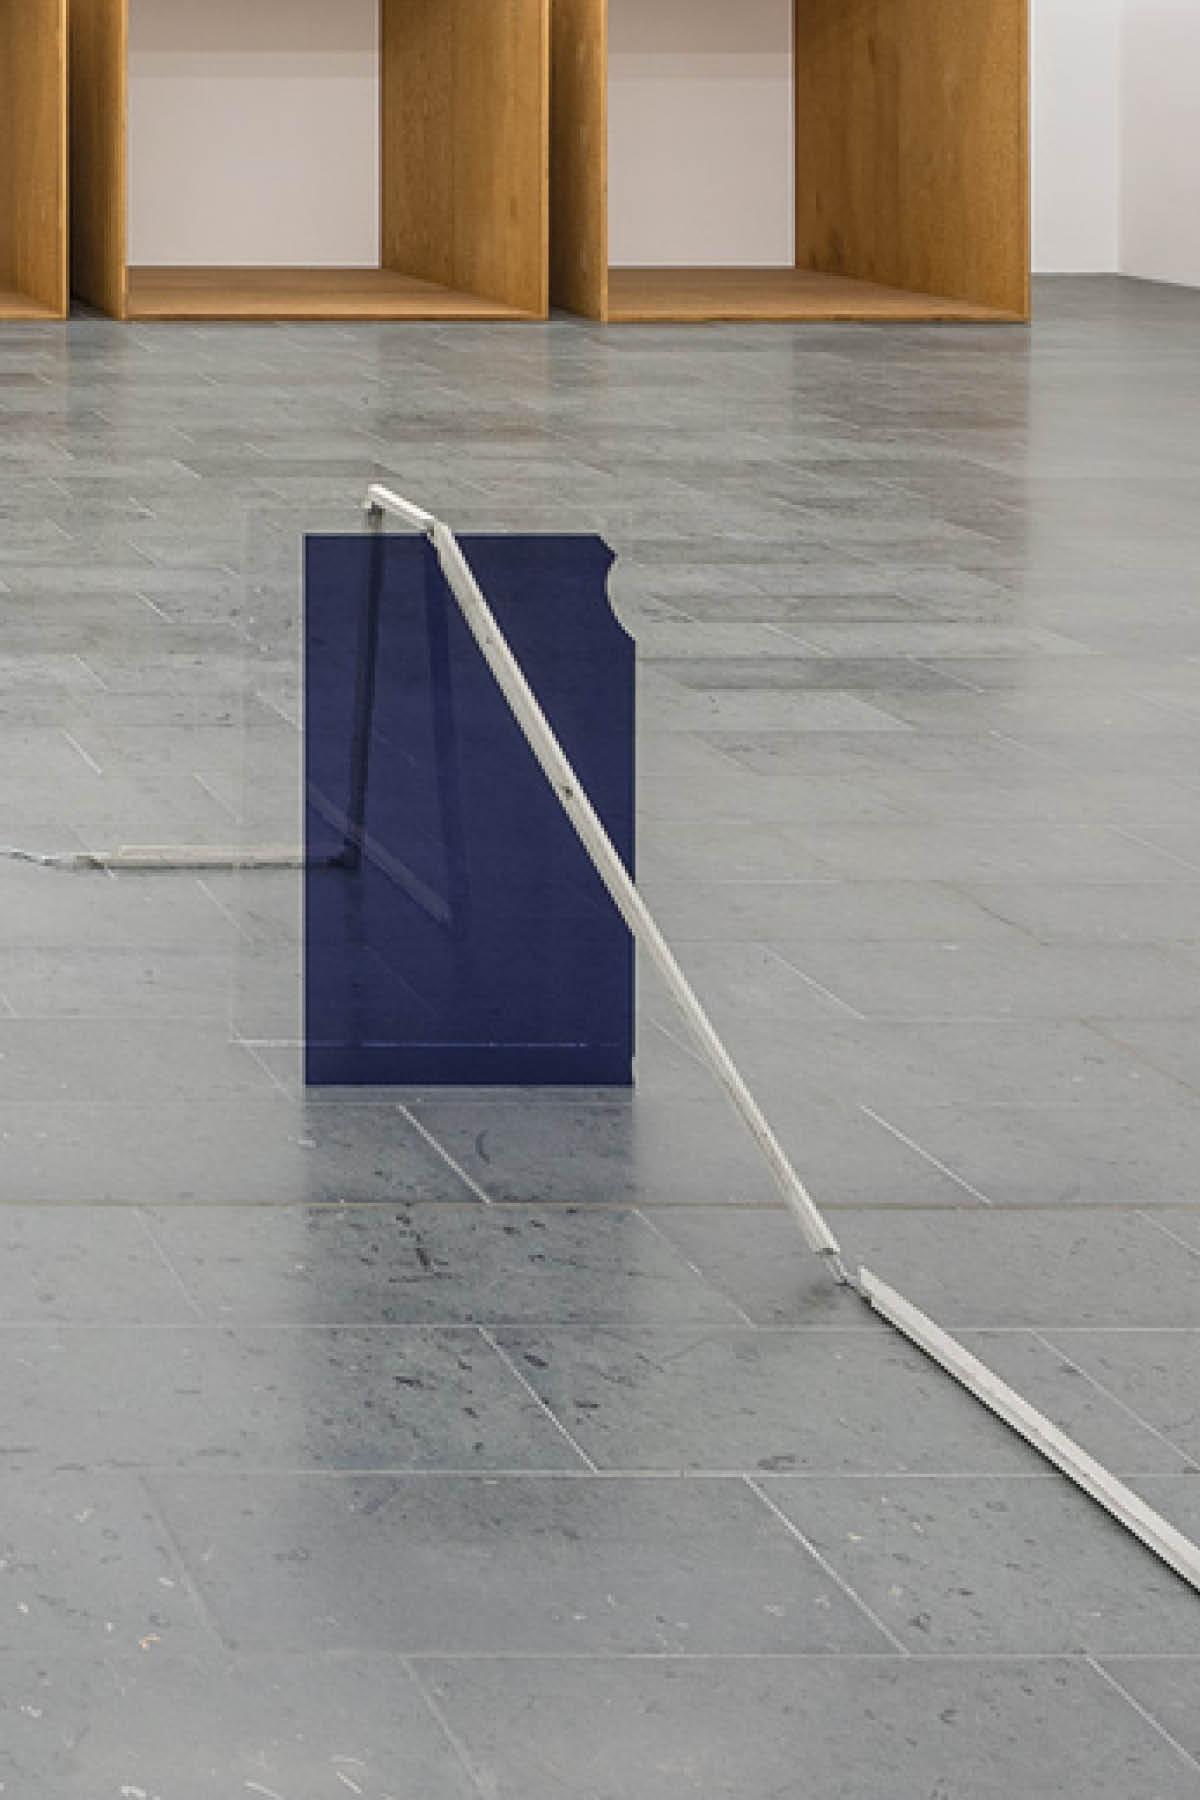 Grösch / Metzger Projects